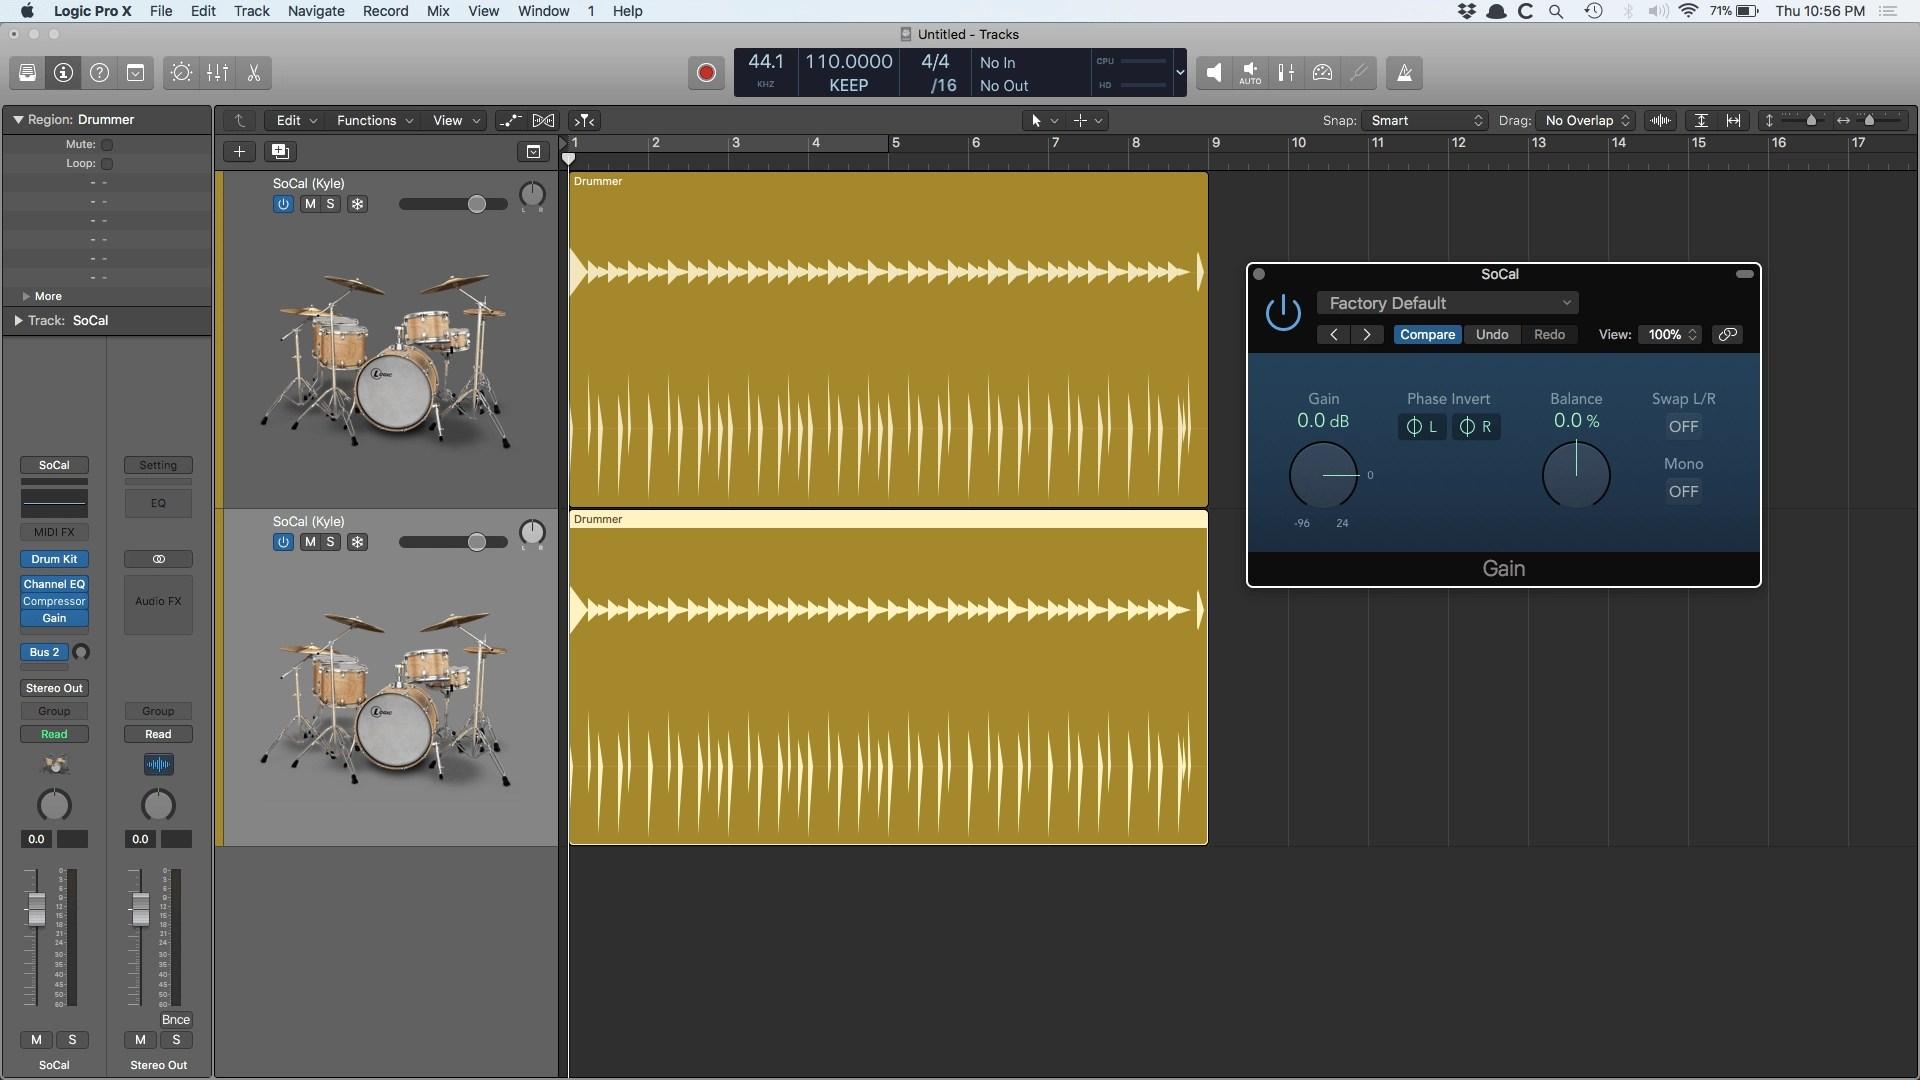 Logic Pro X Drummer Gain Plugin Phase Inverted